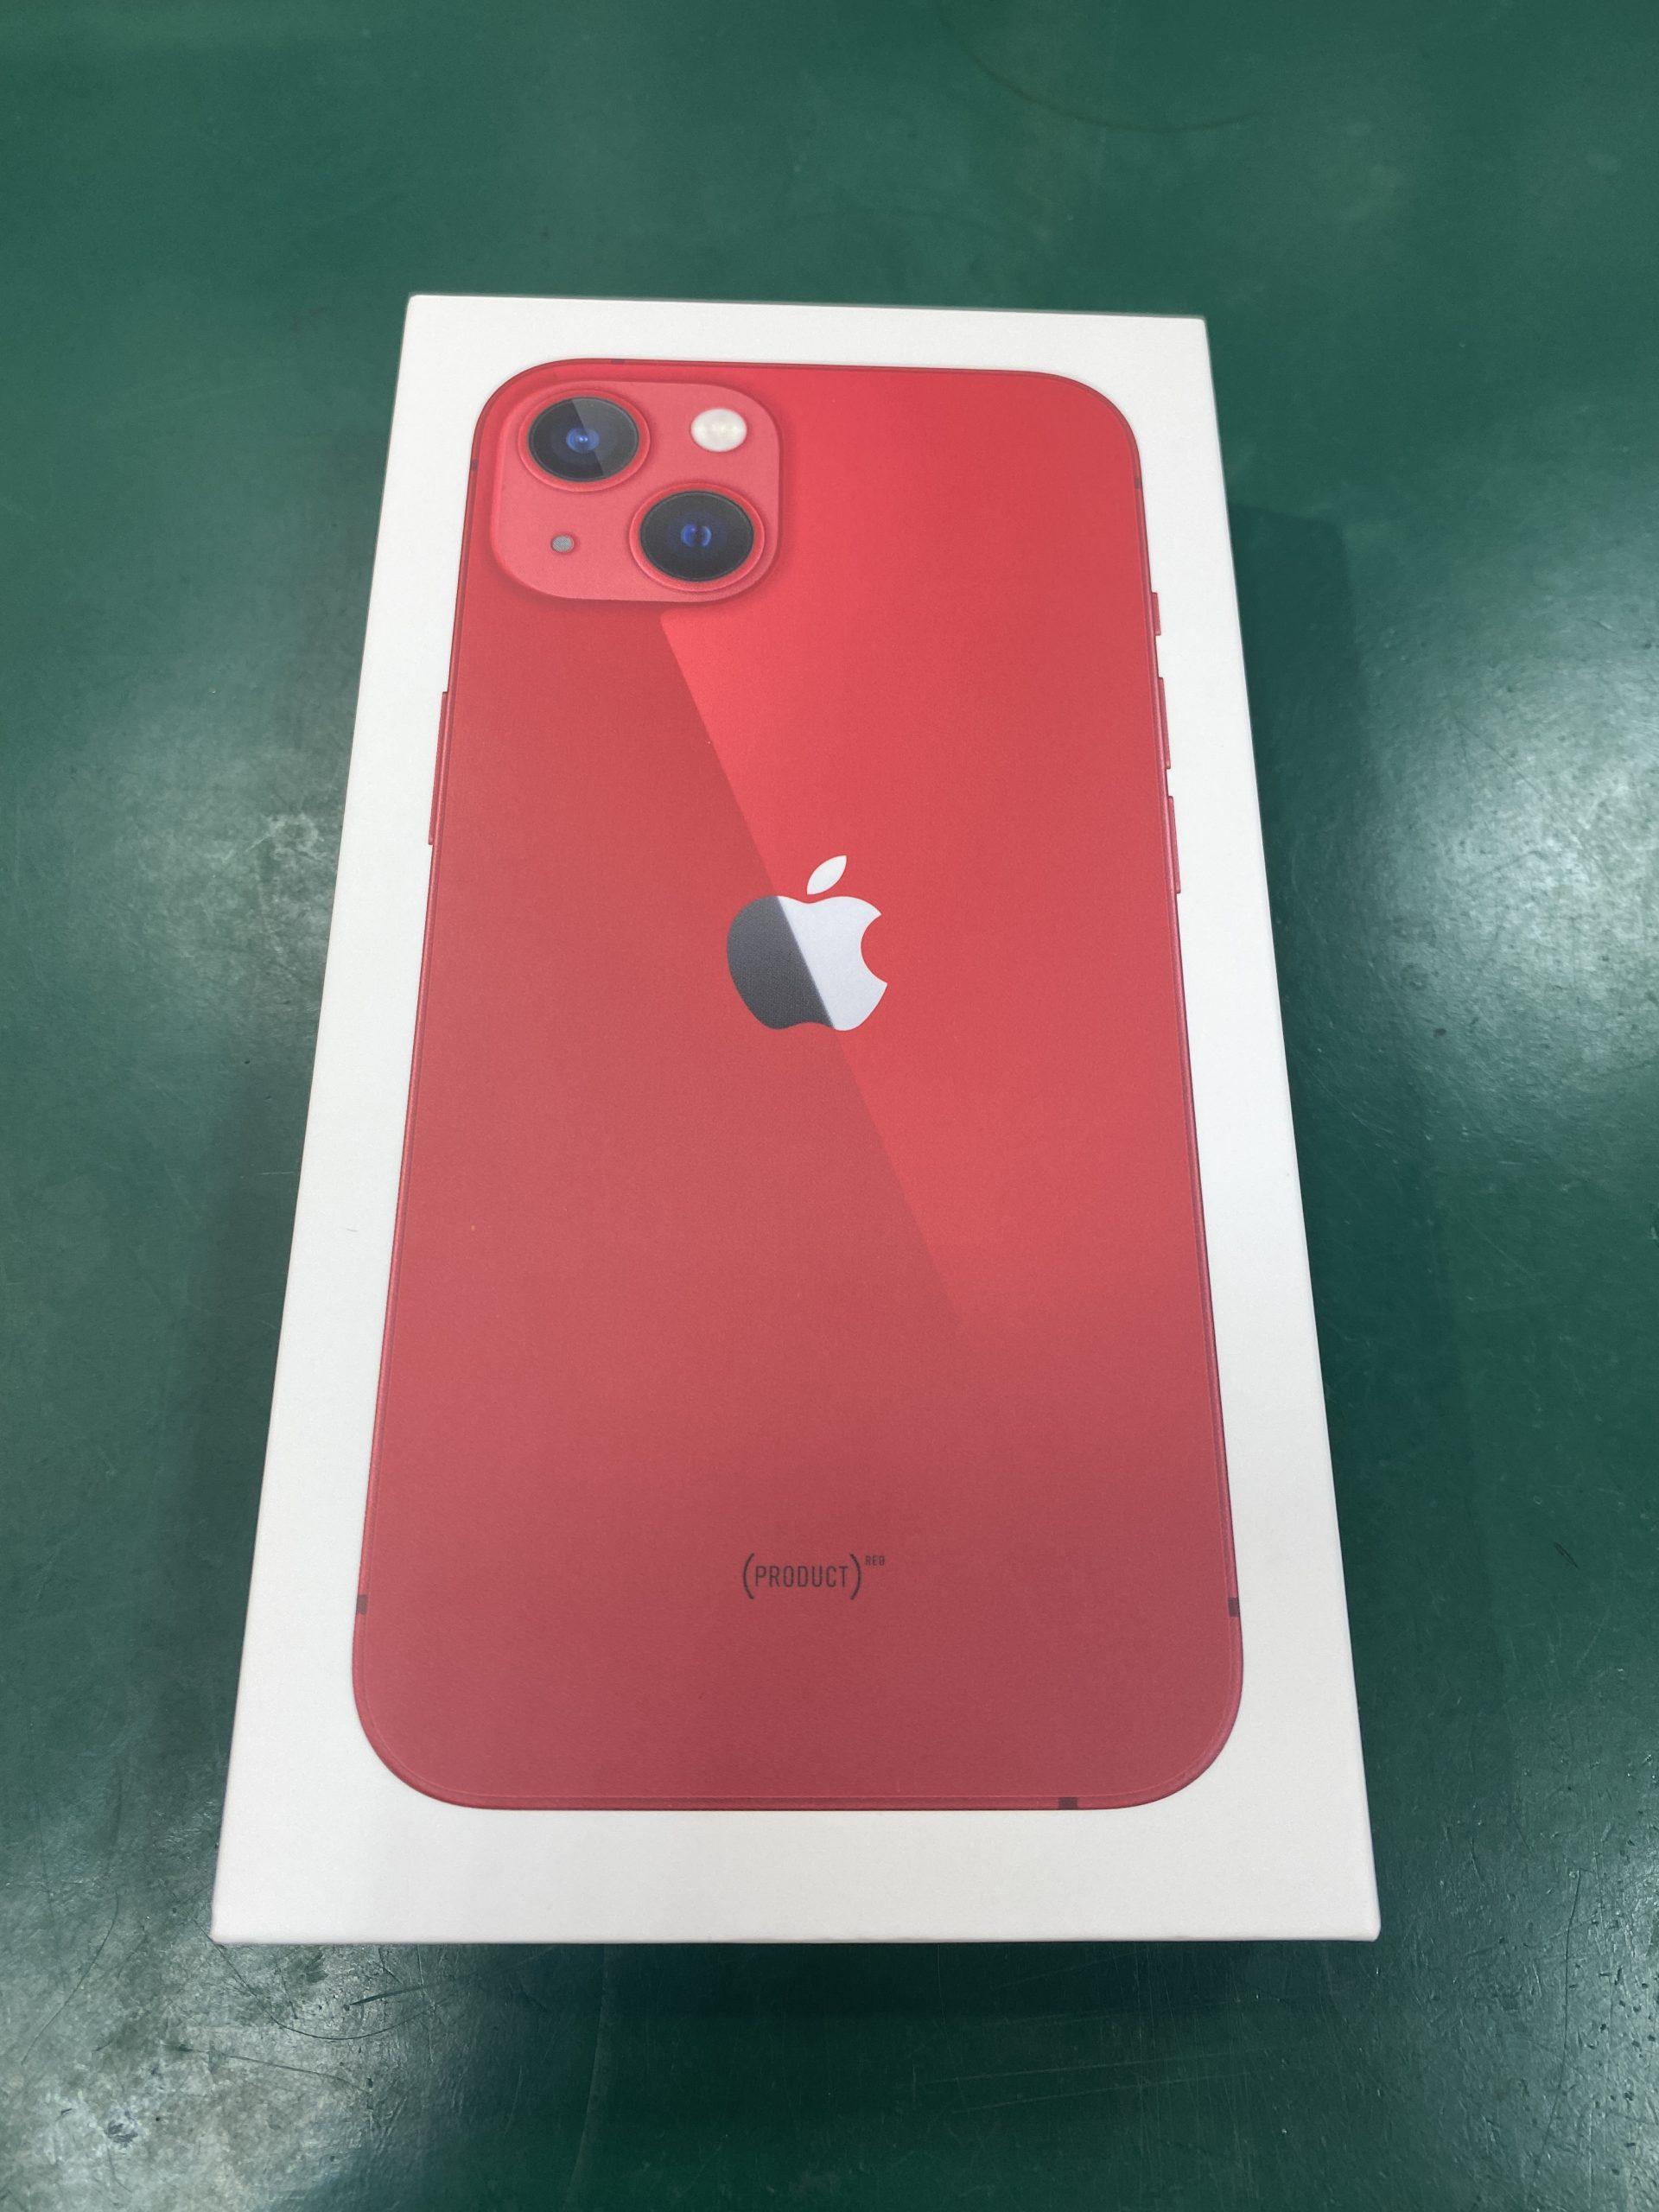 iPhone13128GB レッド SIMフリー 未開封